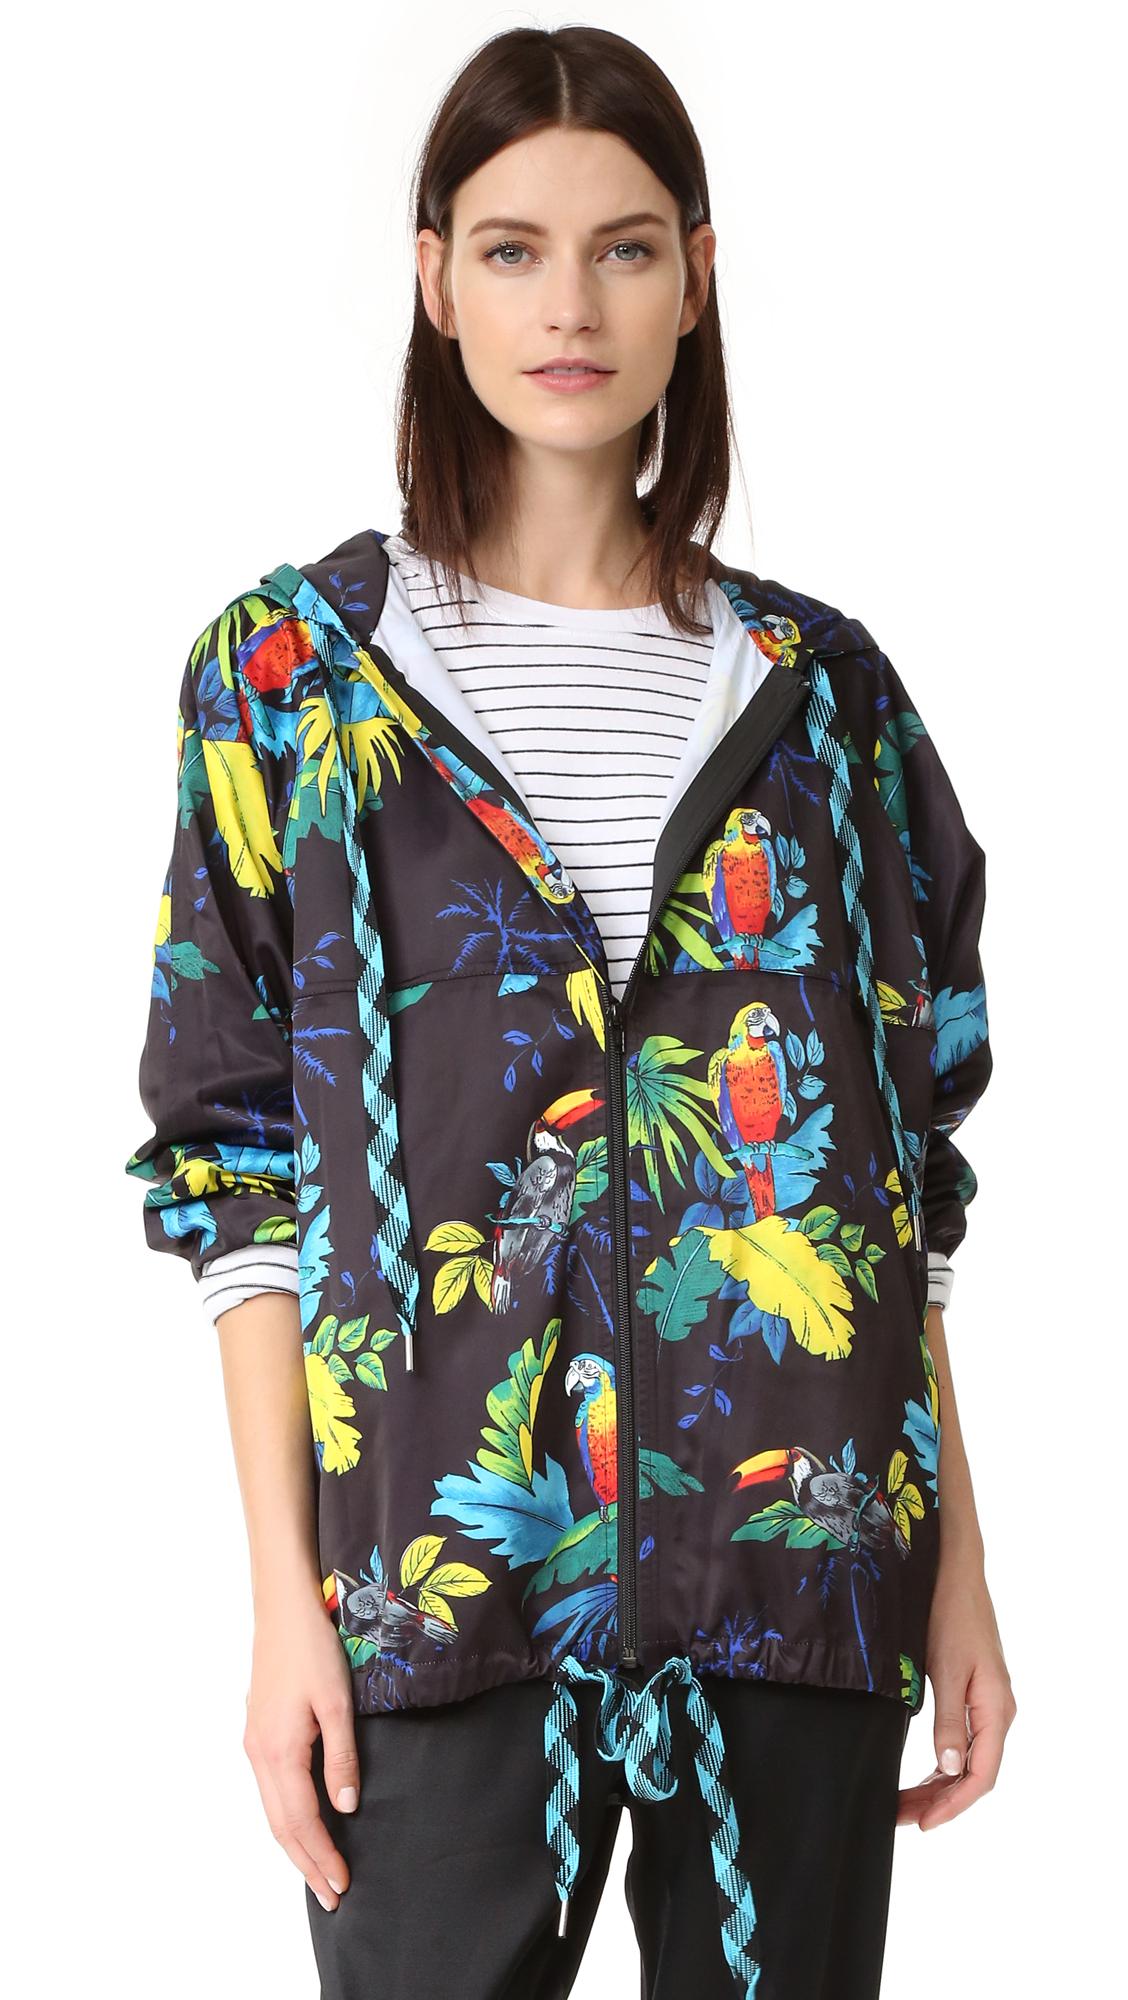 marc jacobs female marc jacobs parrot print hoodie black multi